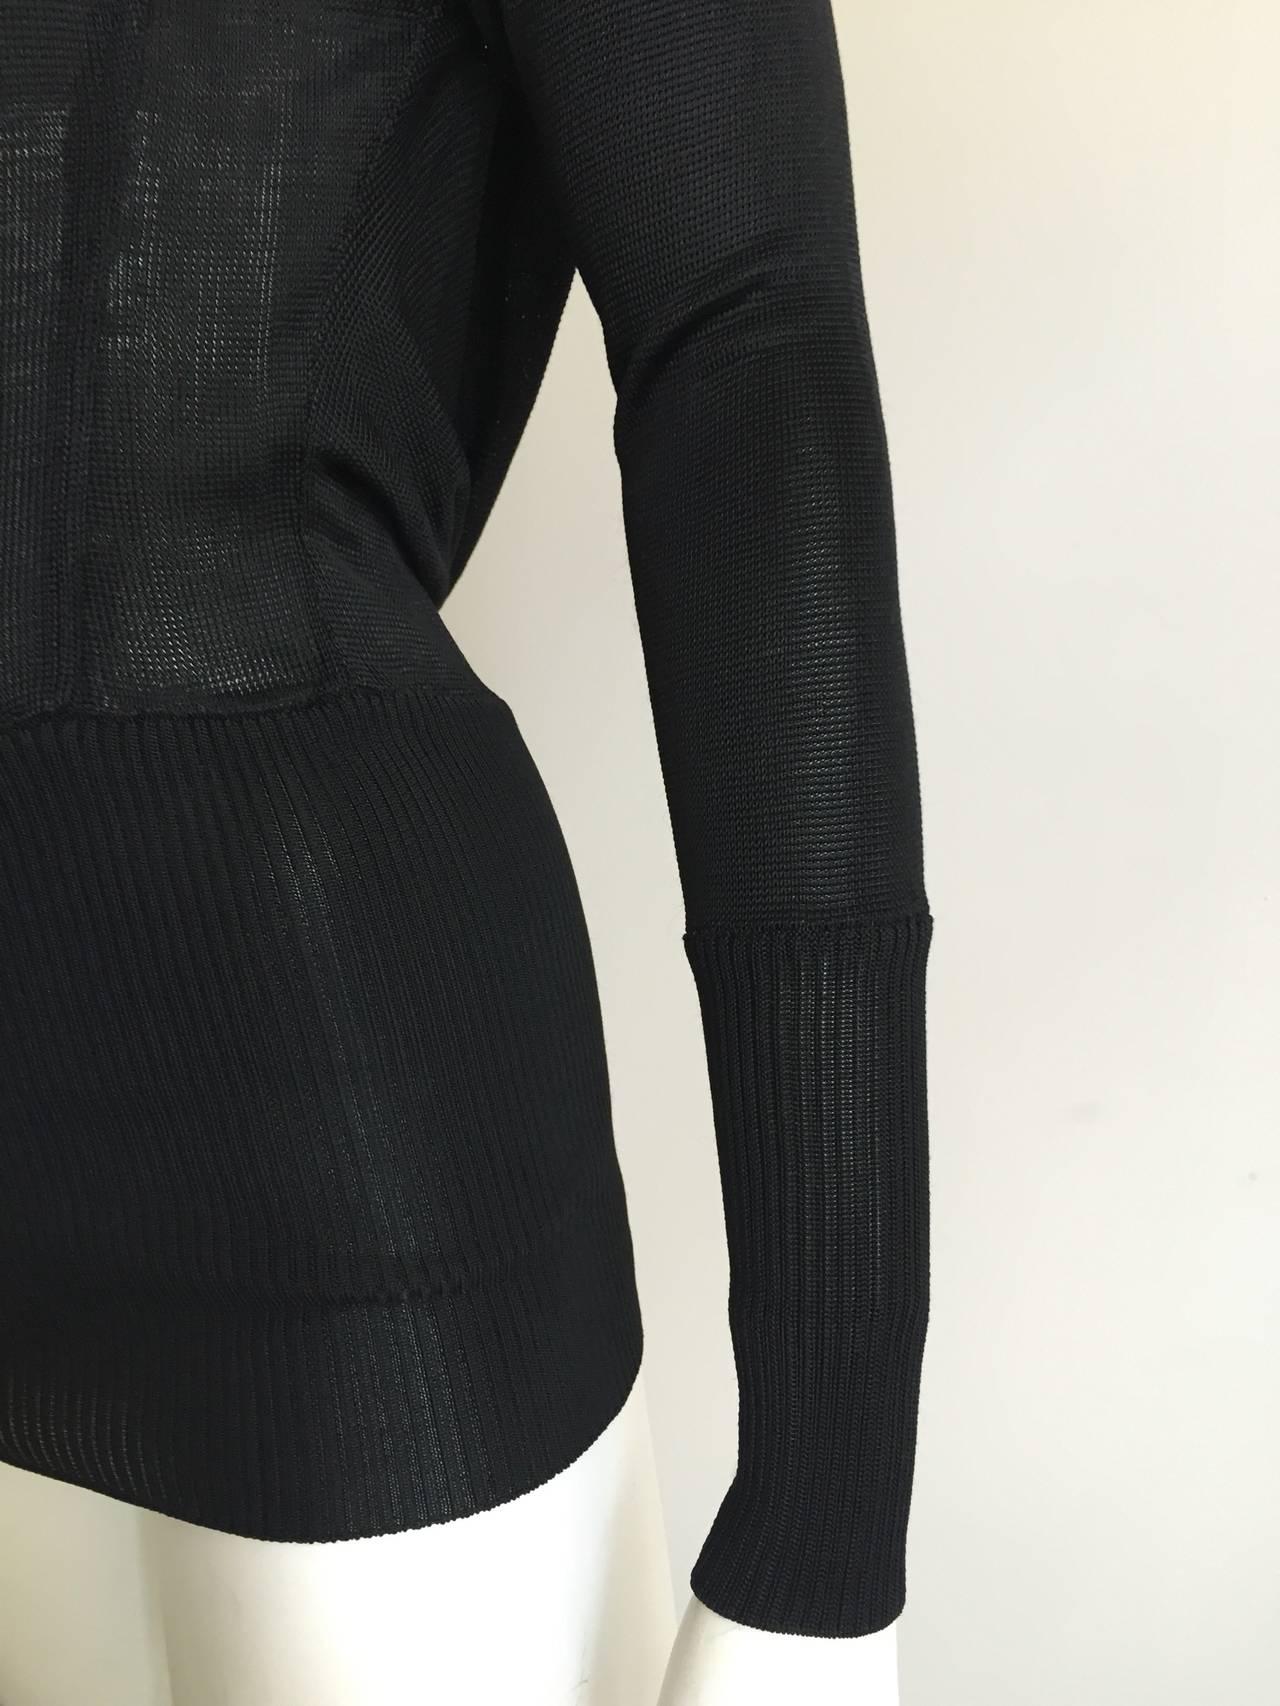 Claude Montana 80s Black Top Size 4 / 6. 3